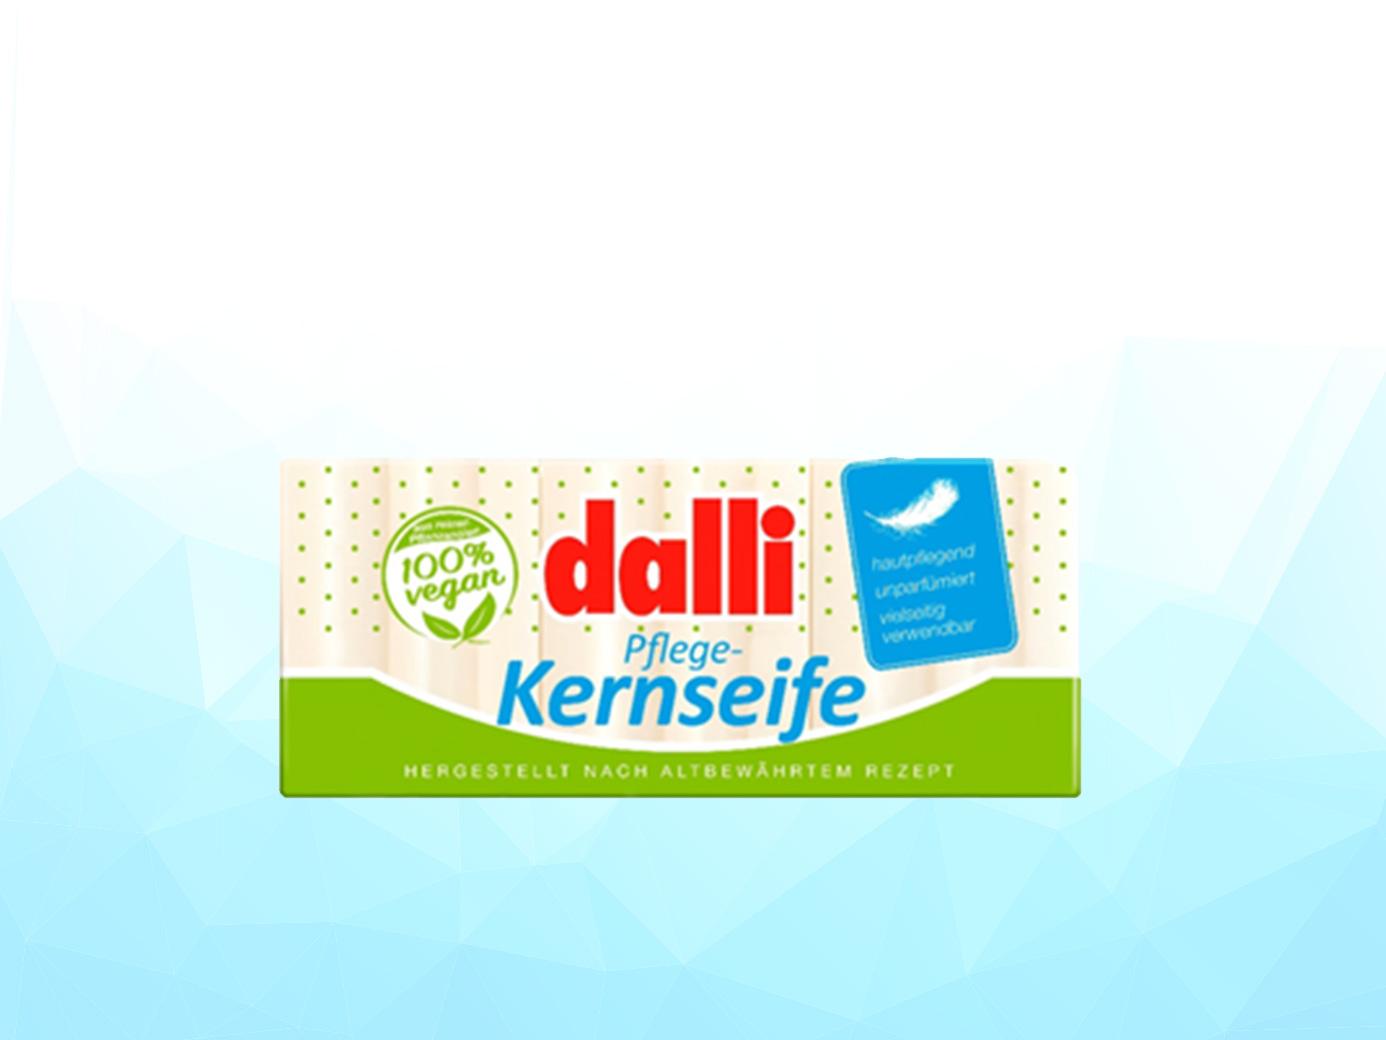 dalli純植物油親膚抗敏洗衣皂- 德國百年歷史的好選擇